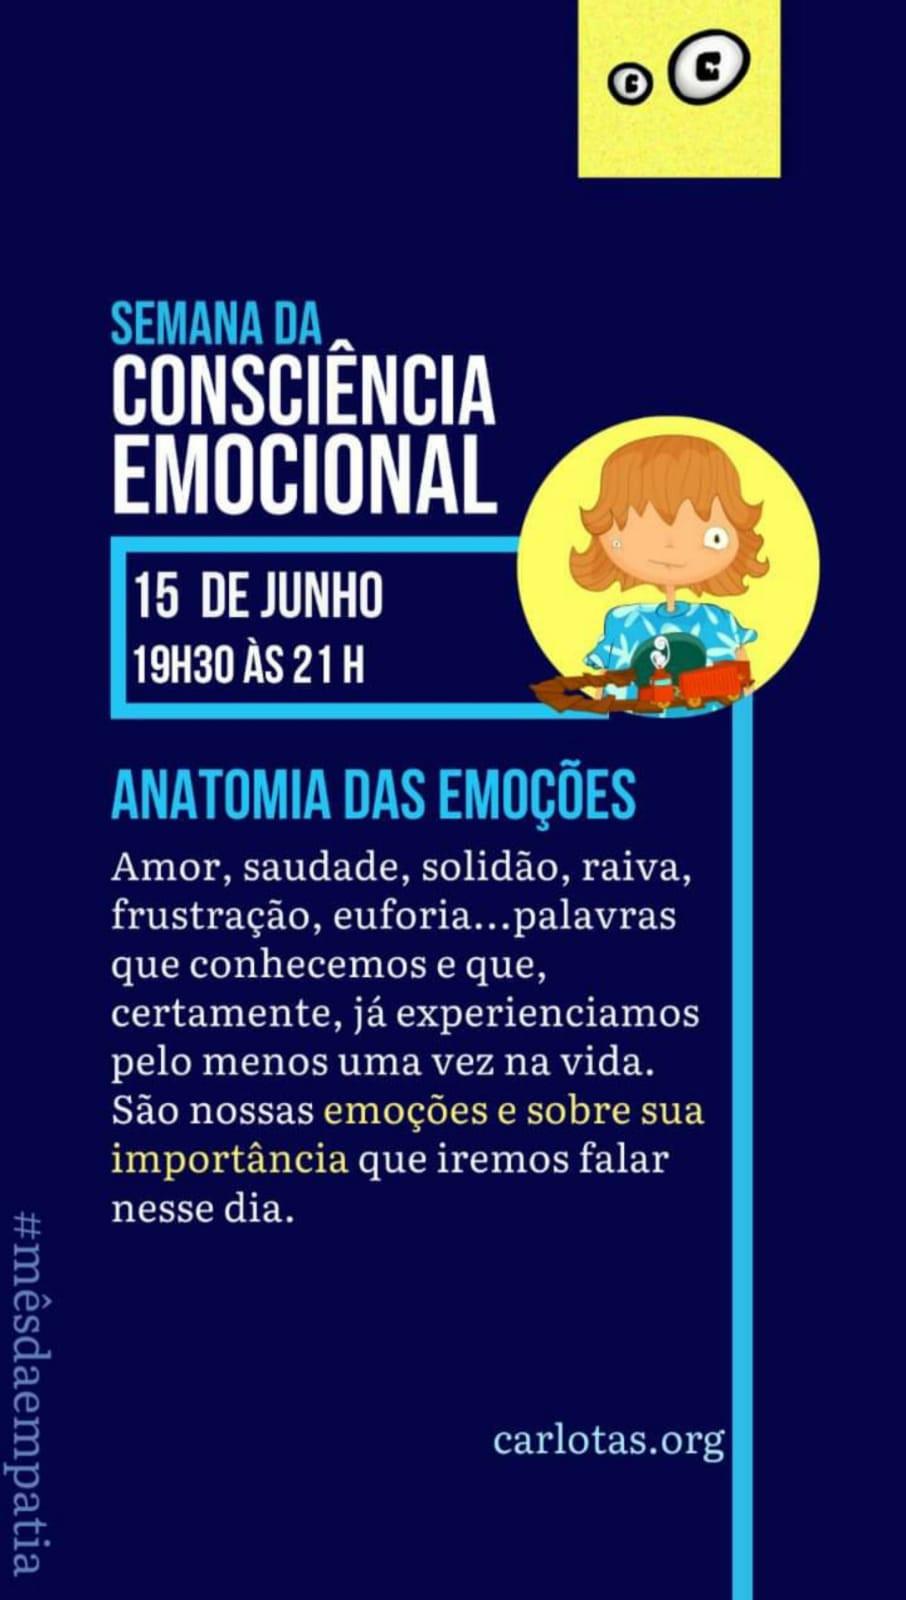 semana-da-consciencia-emocional-anatomia-das-emocoes